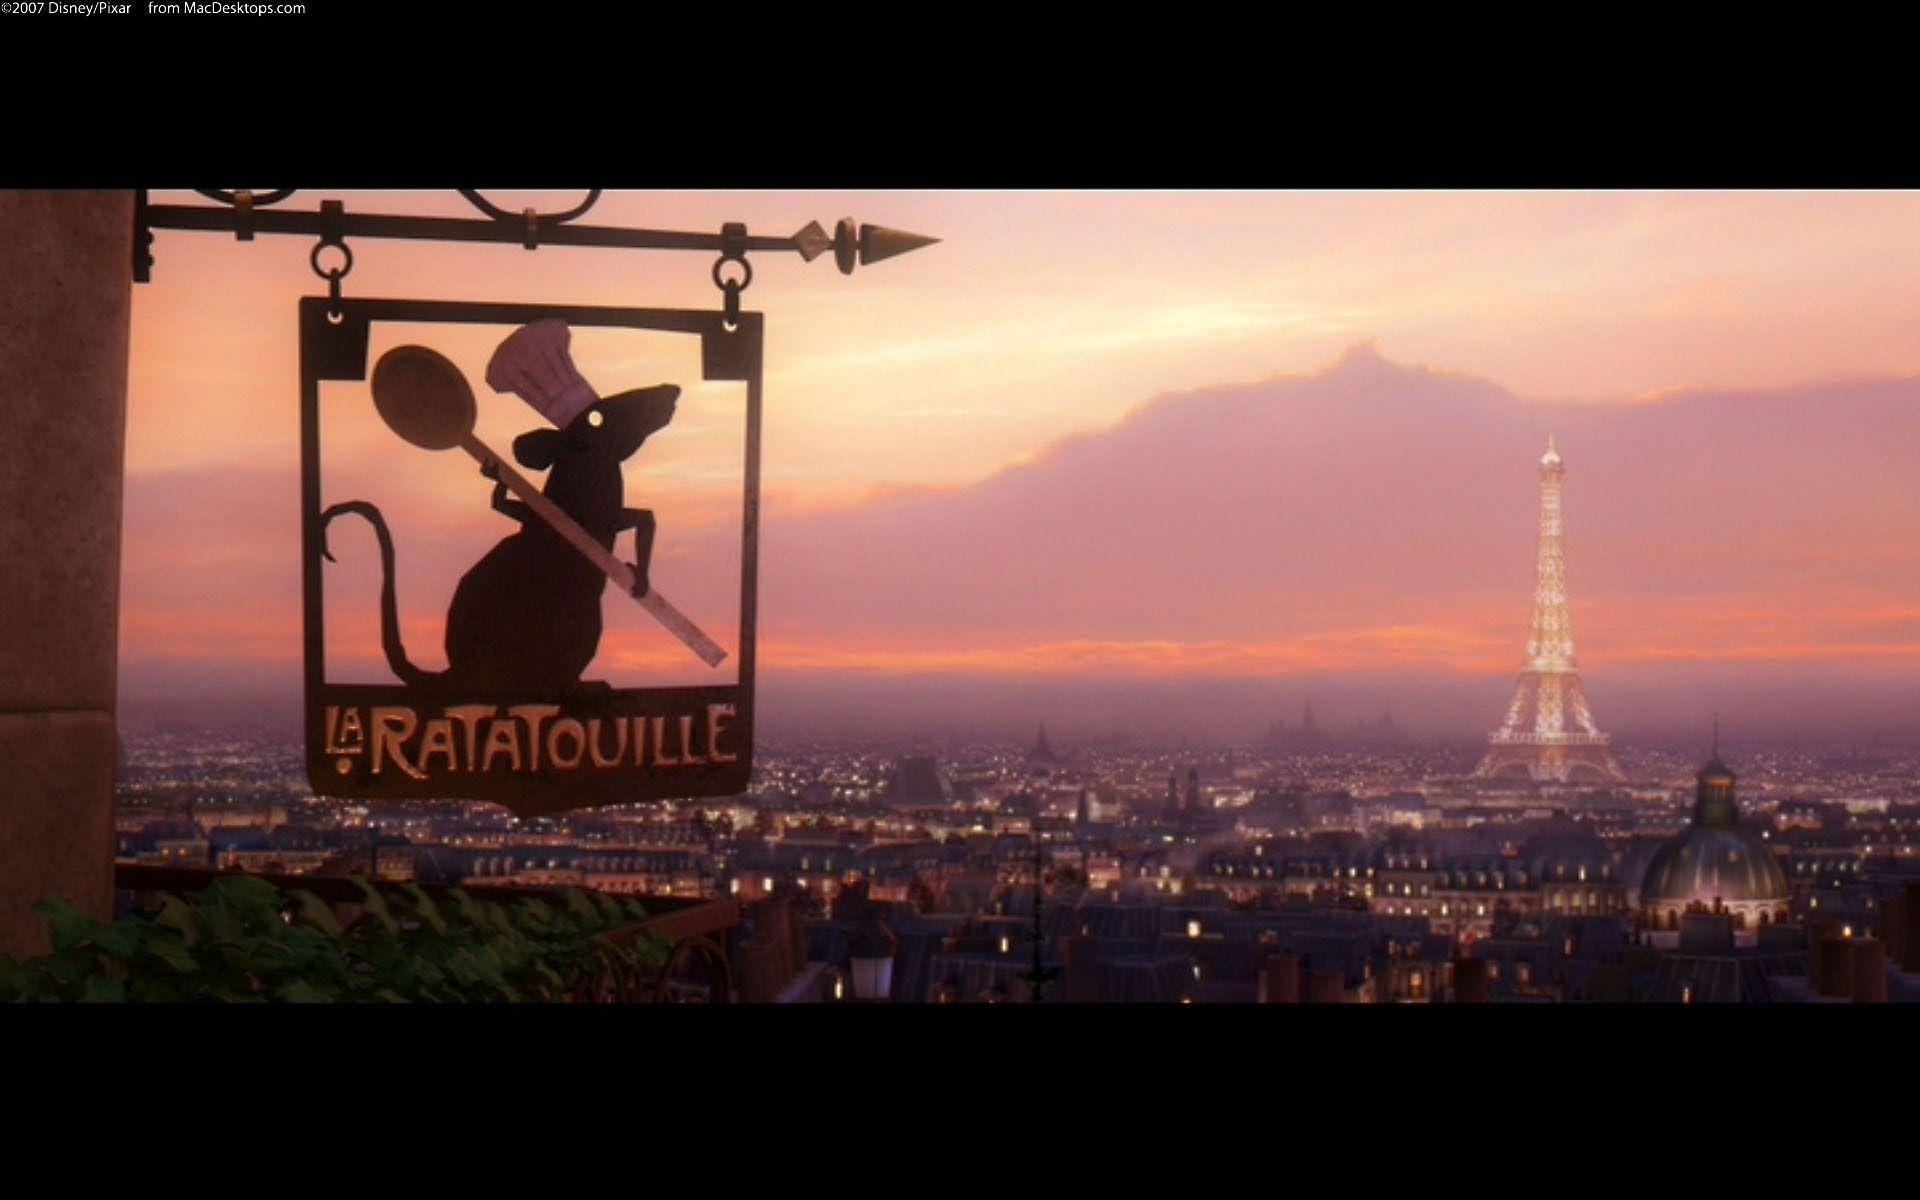 Ratatouille wallpaper hd - photo#4